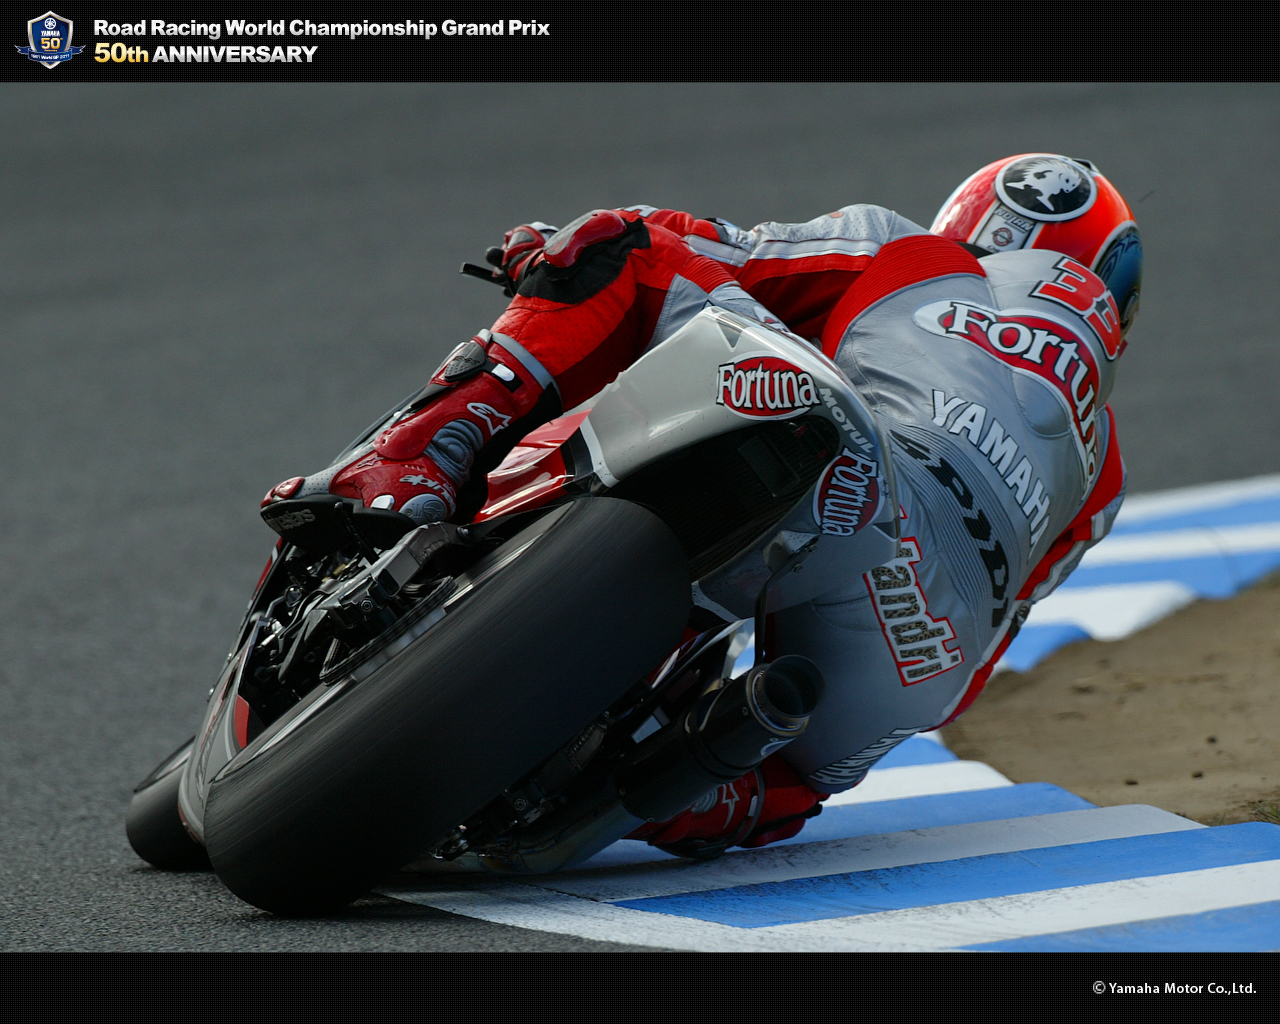 Marco Melandri Race Yamaha Motor Co Ltd